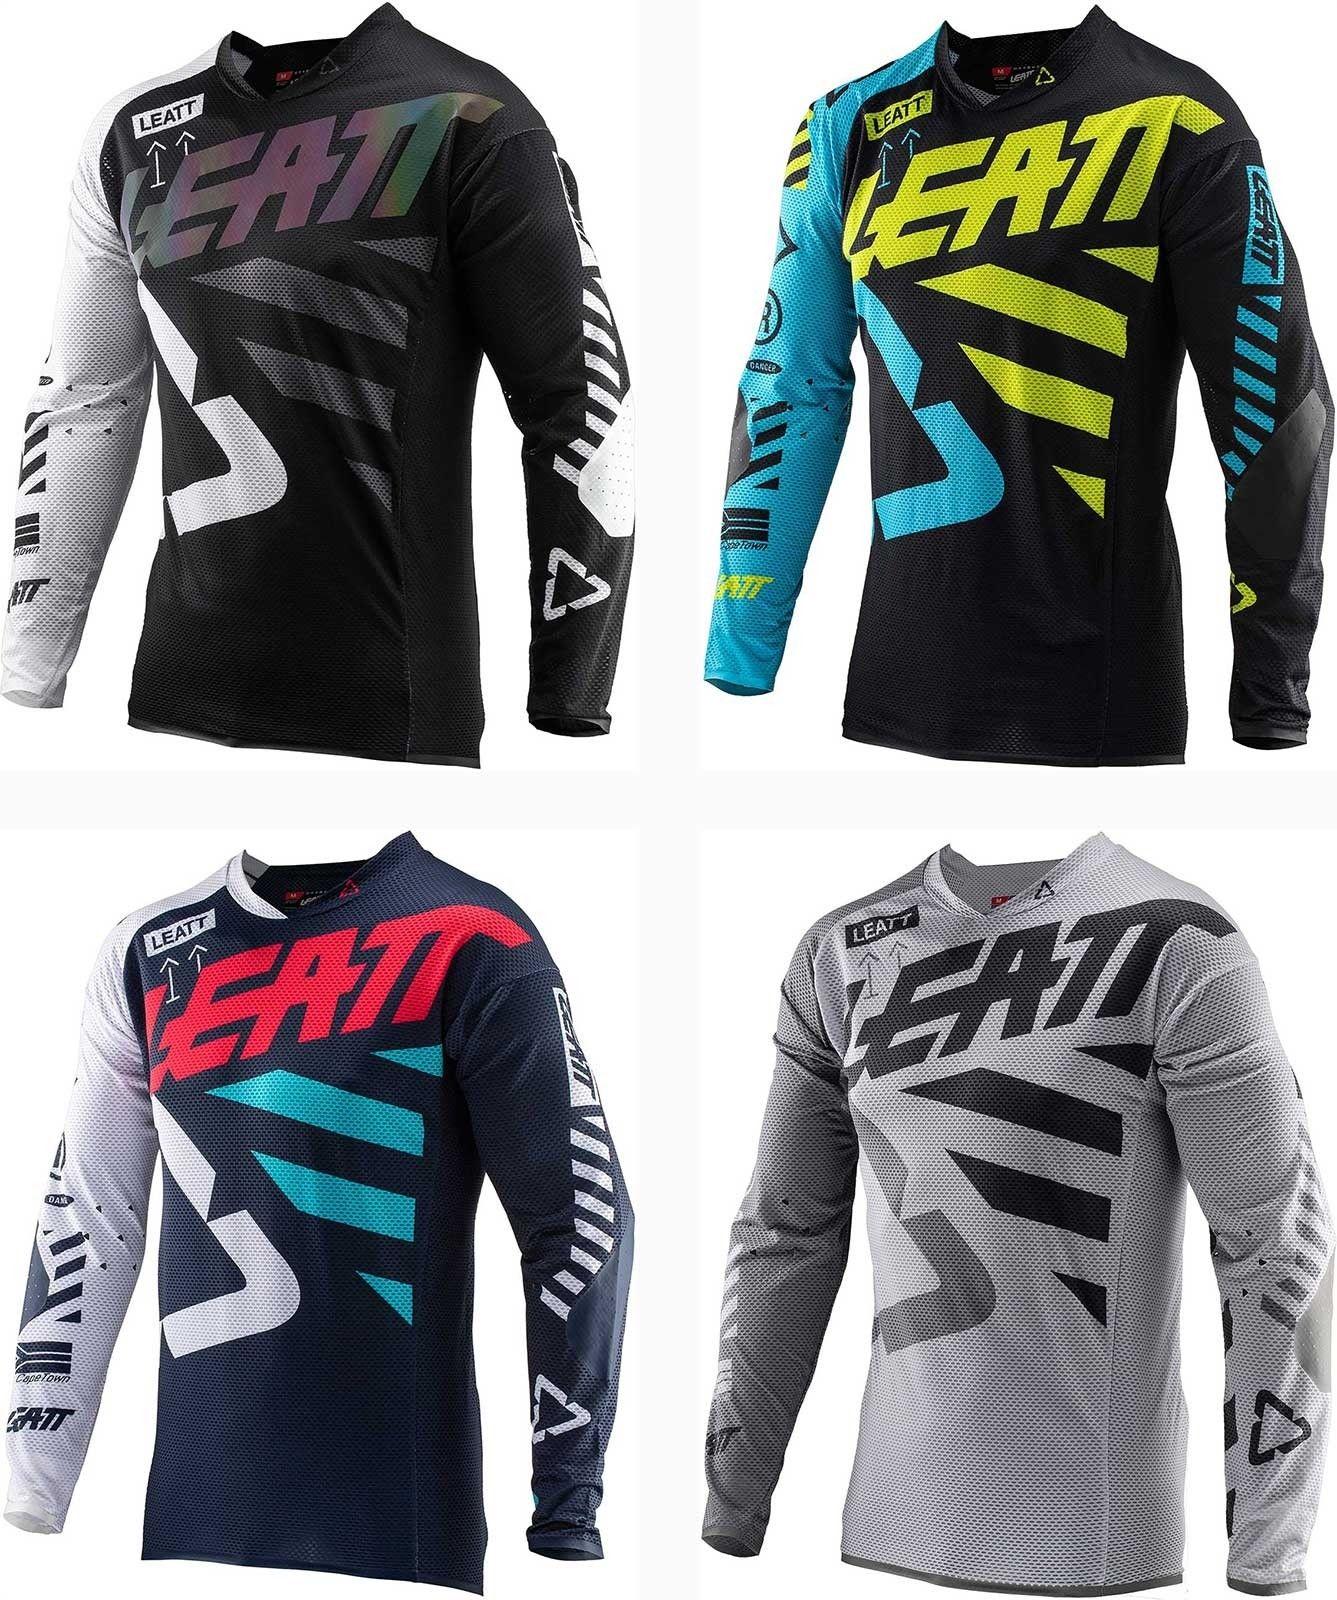 509762cb7 best maillot de ciclismo de mtb brands and get free shipping - List ...